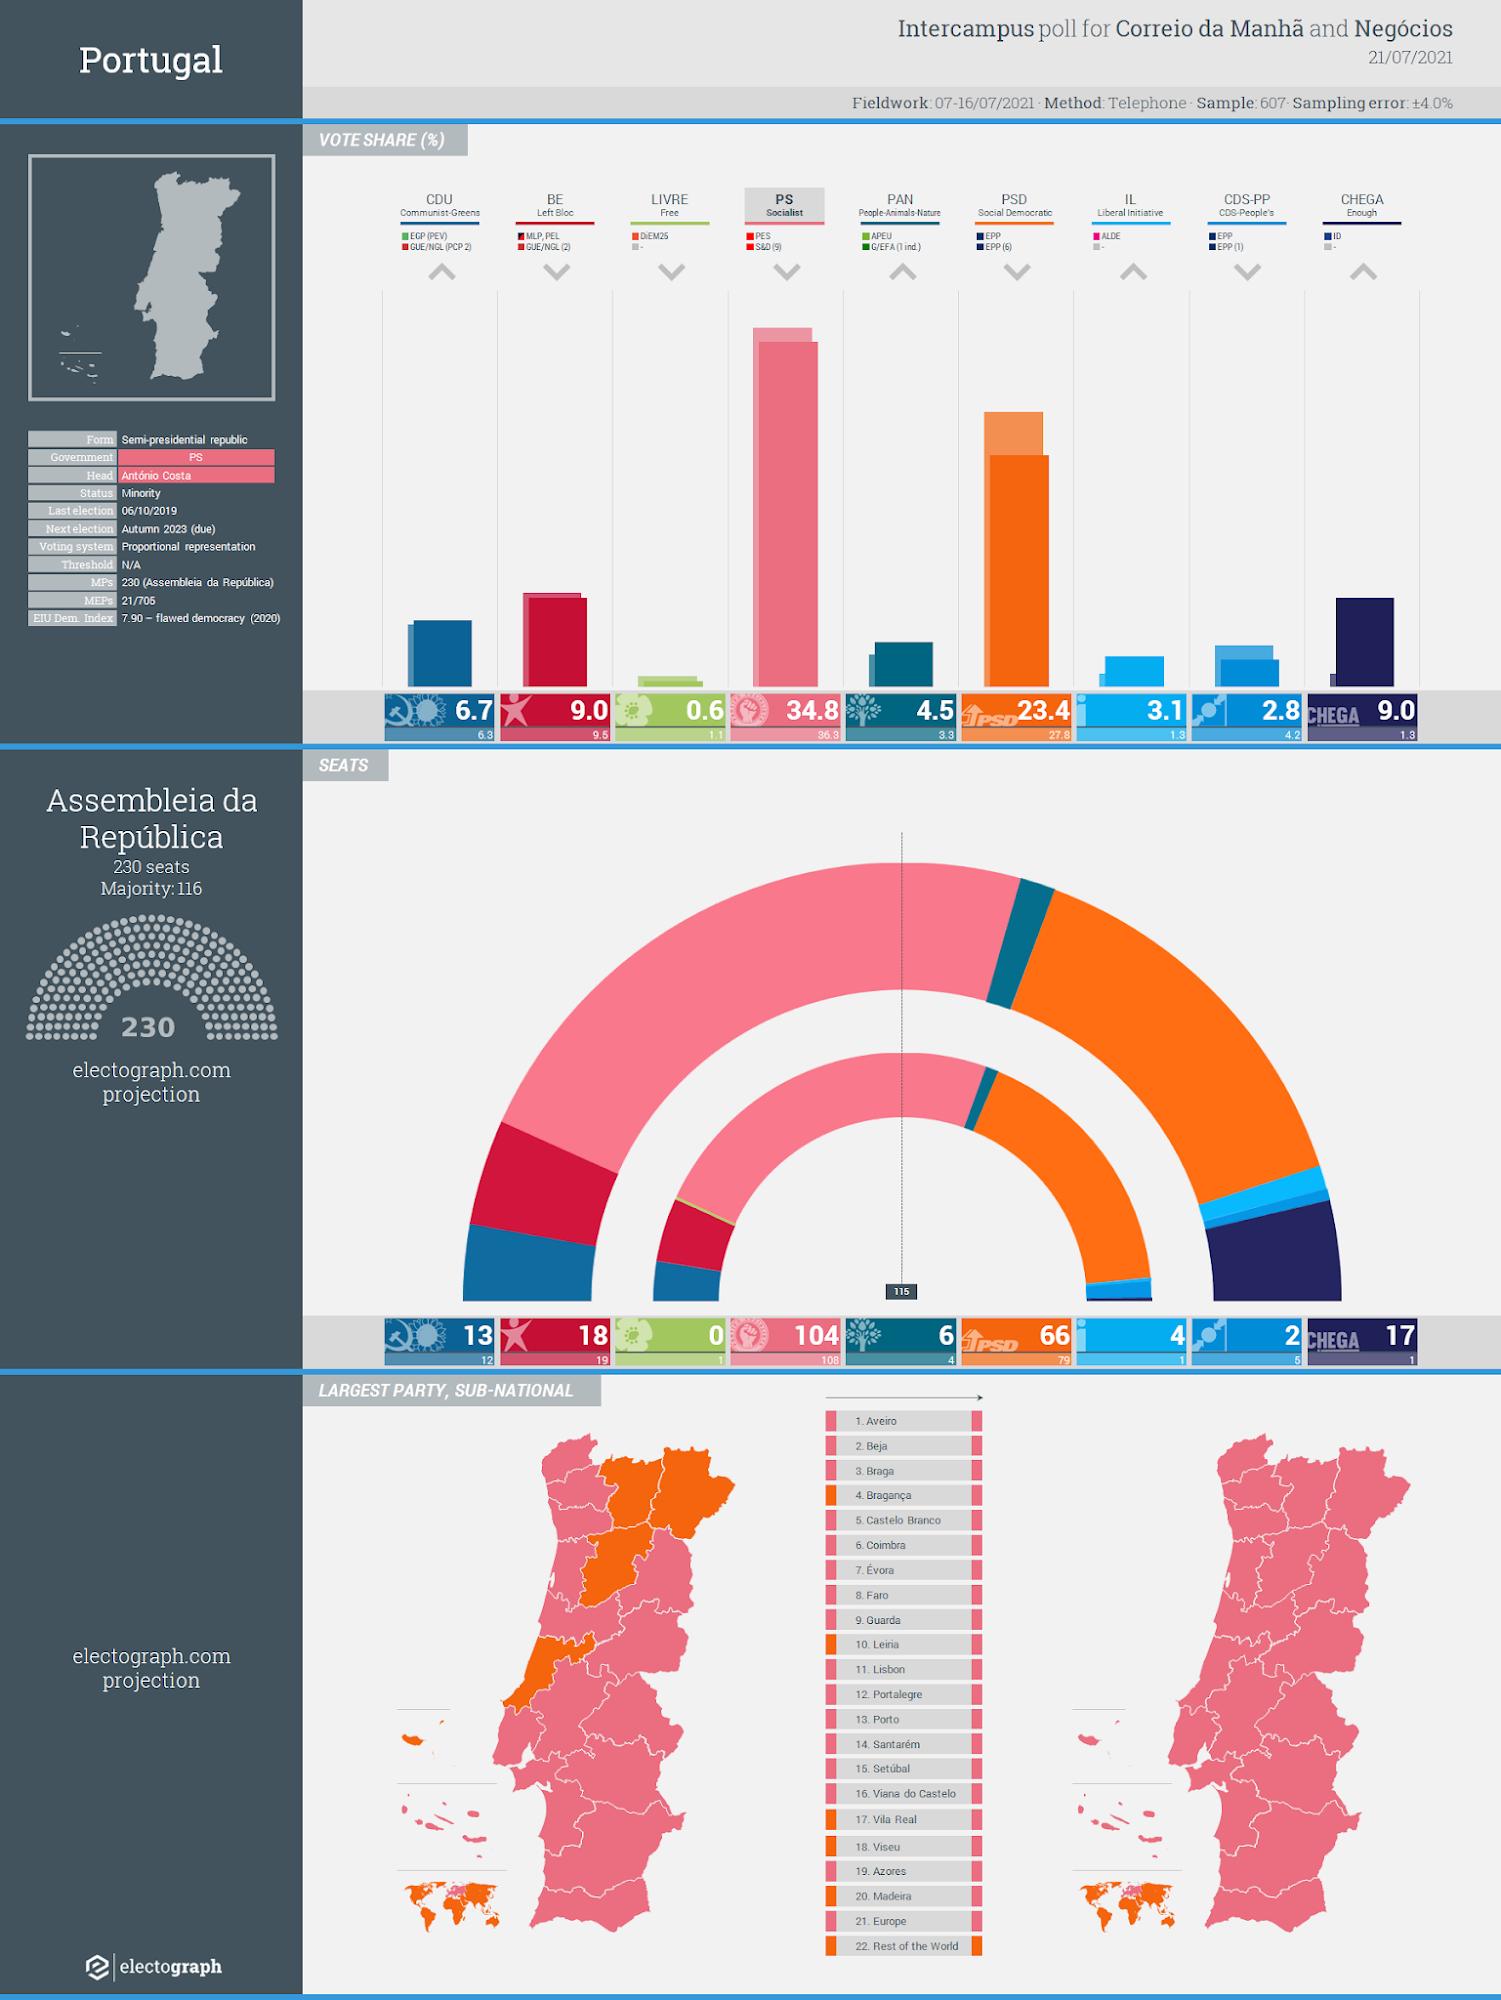 PORTUGAL: Intercampus poll chart for Correio da Manhã and Negócios, 21 July 2021